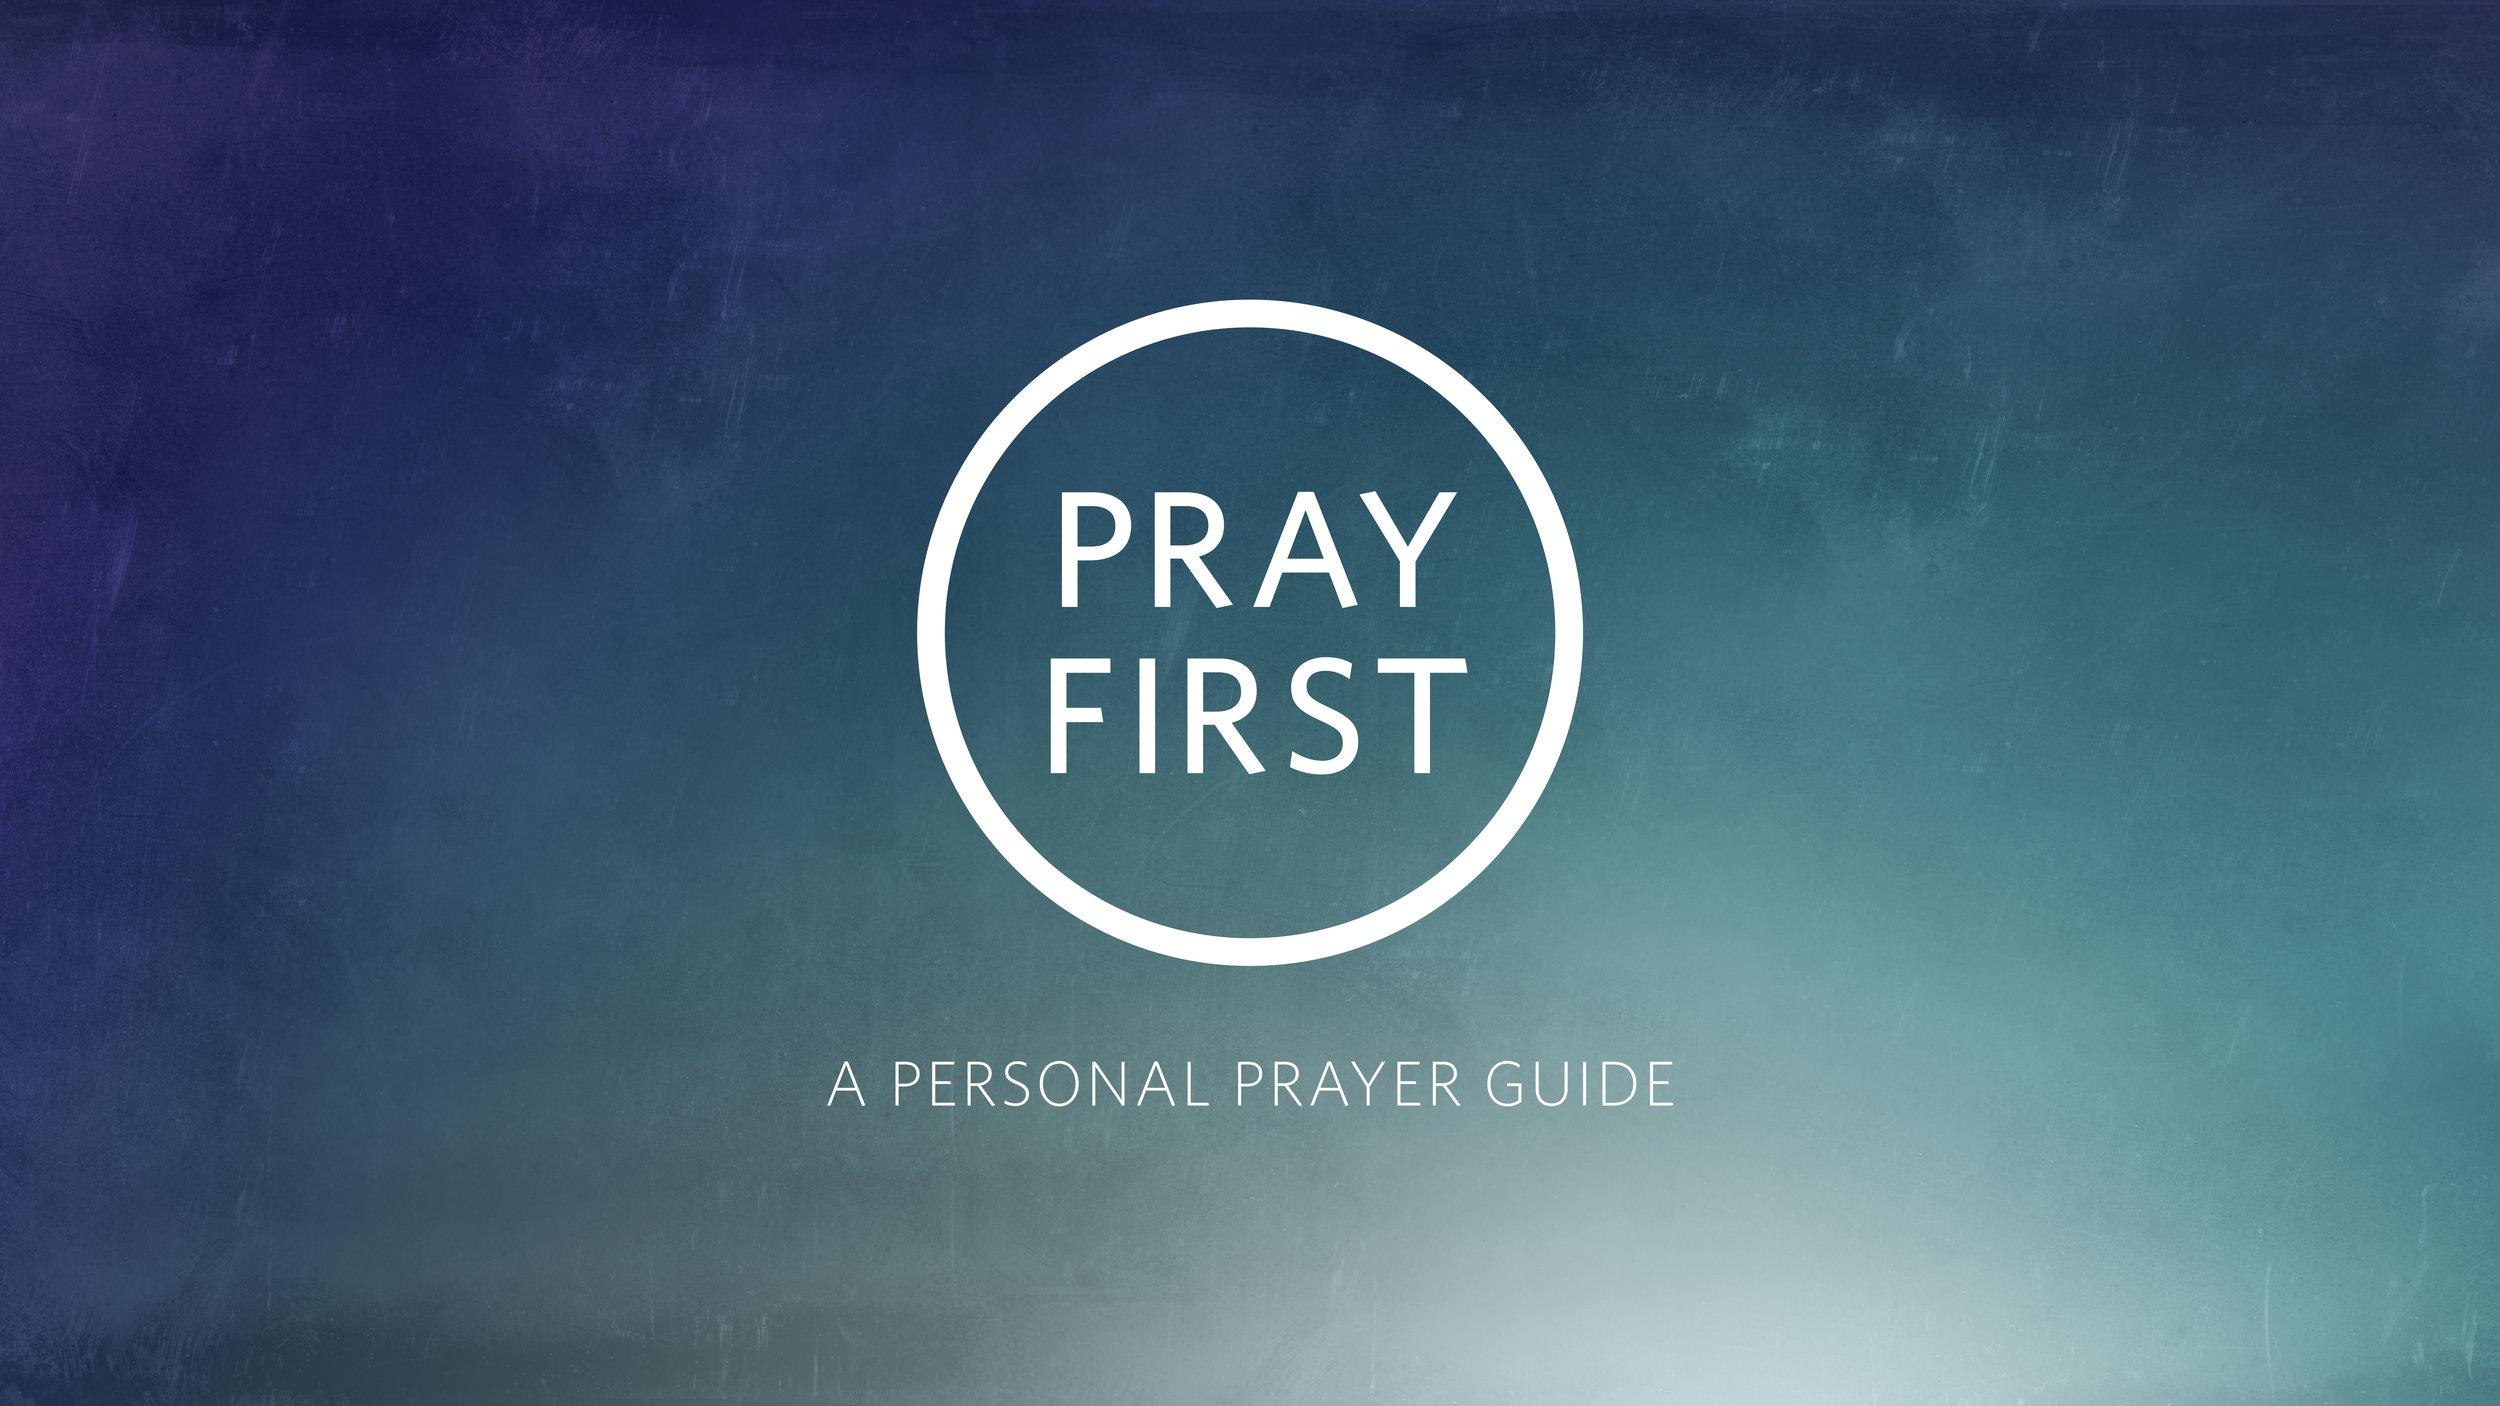 DOWNLOAD PDF PRAYER GUIDE HERE